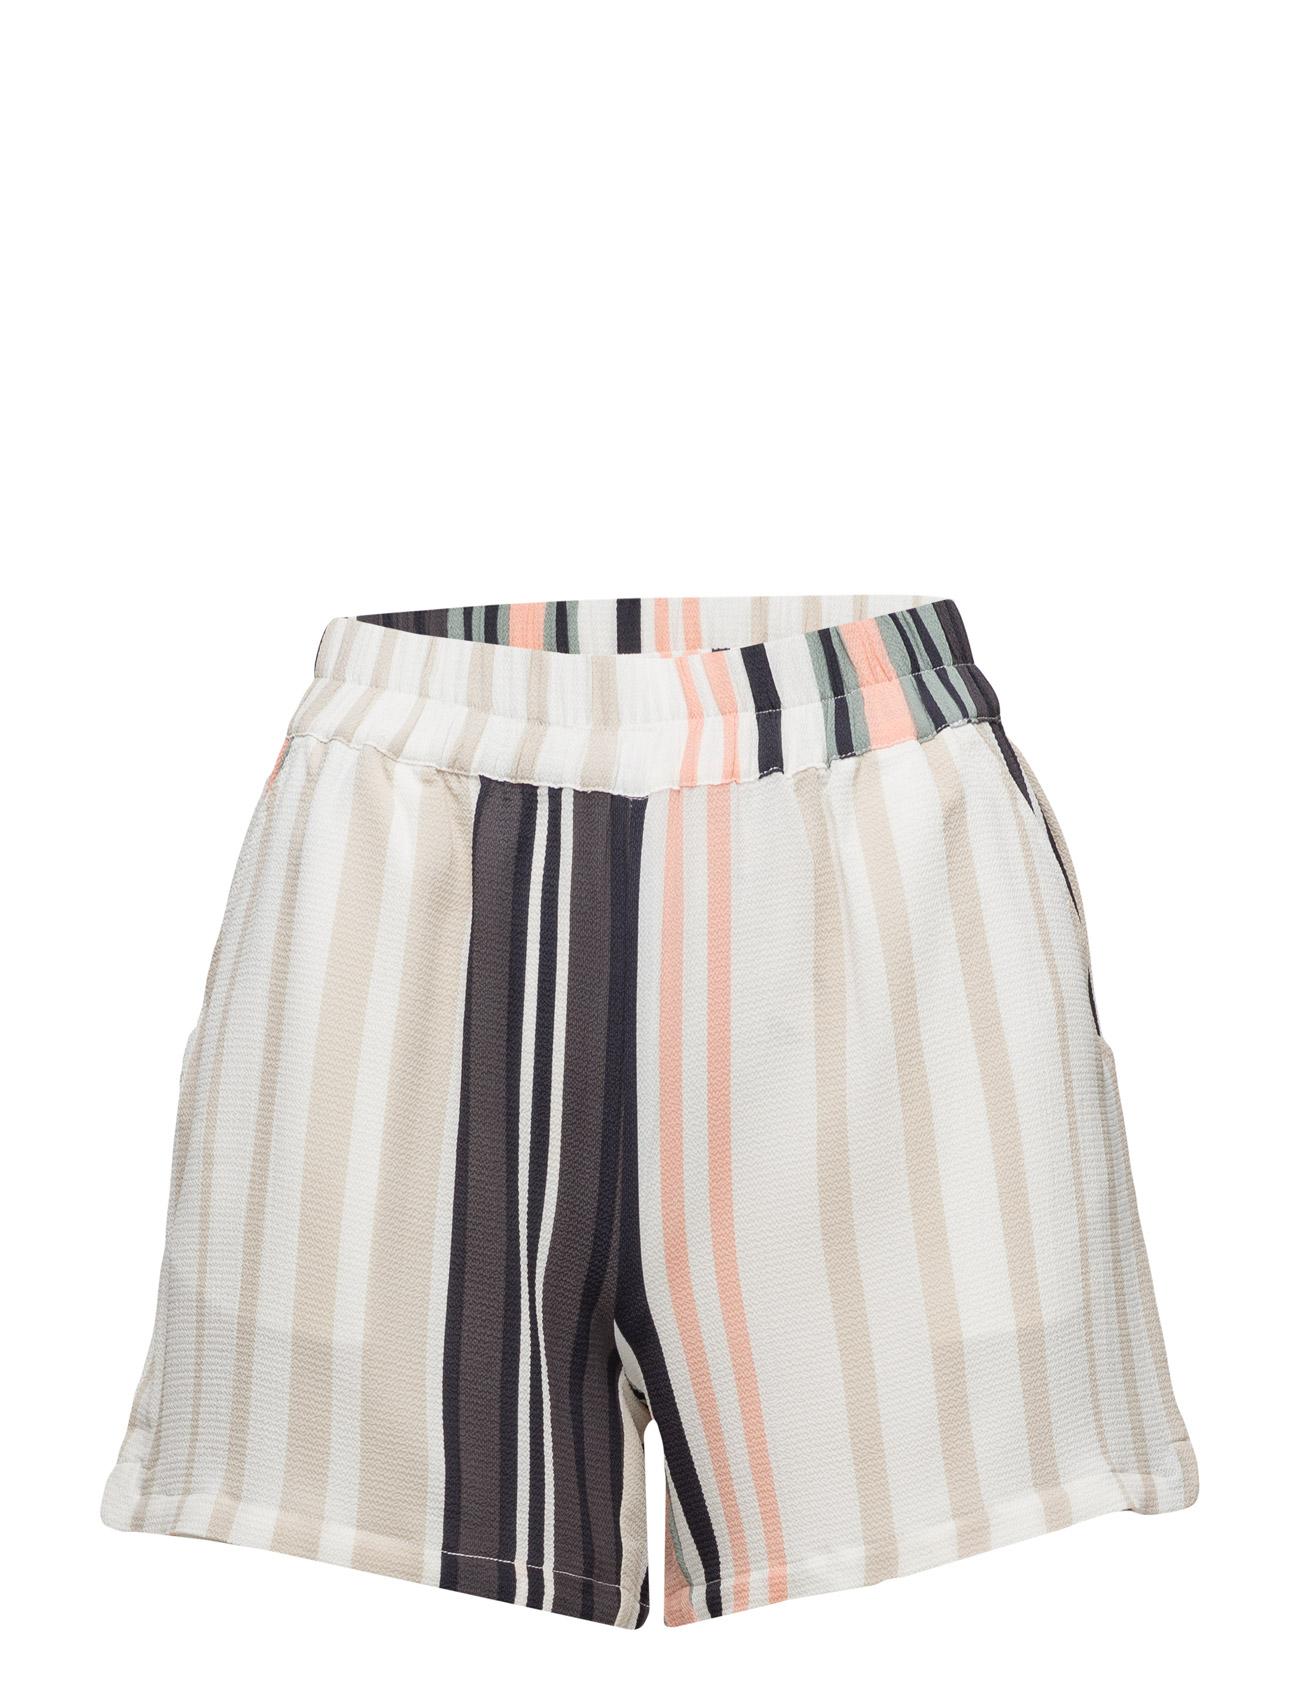 saint tropez Variegated stripe shorts på boozt.com dk